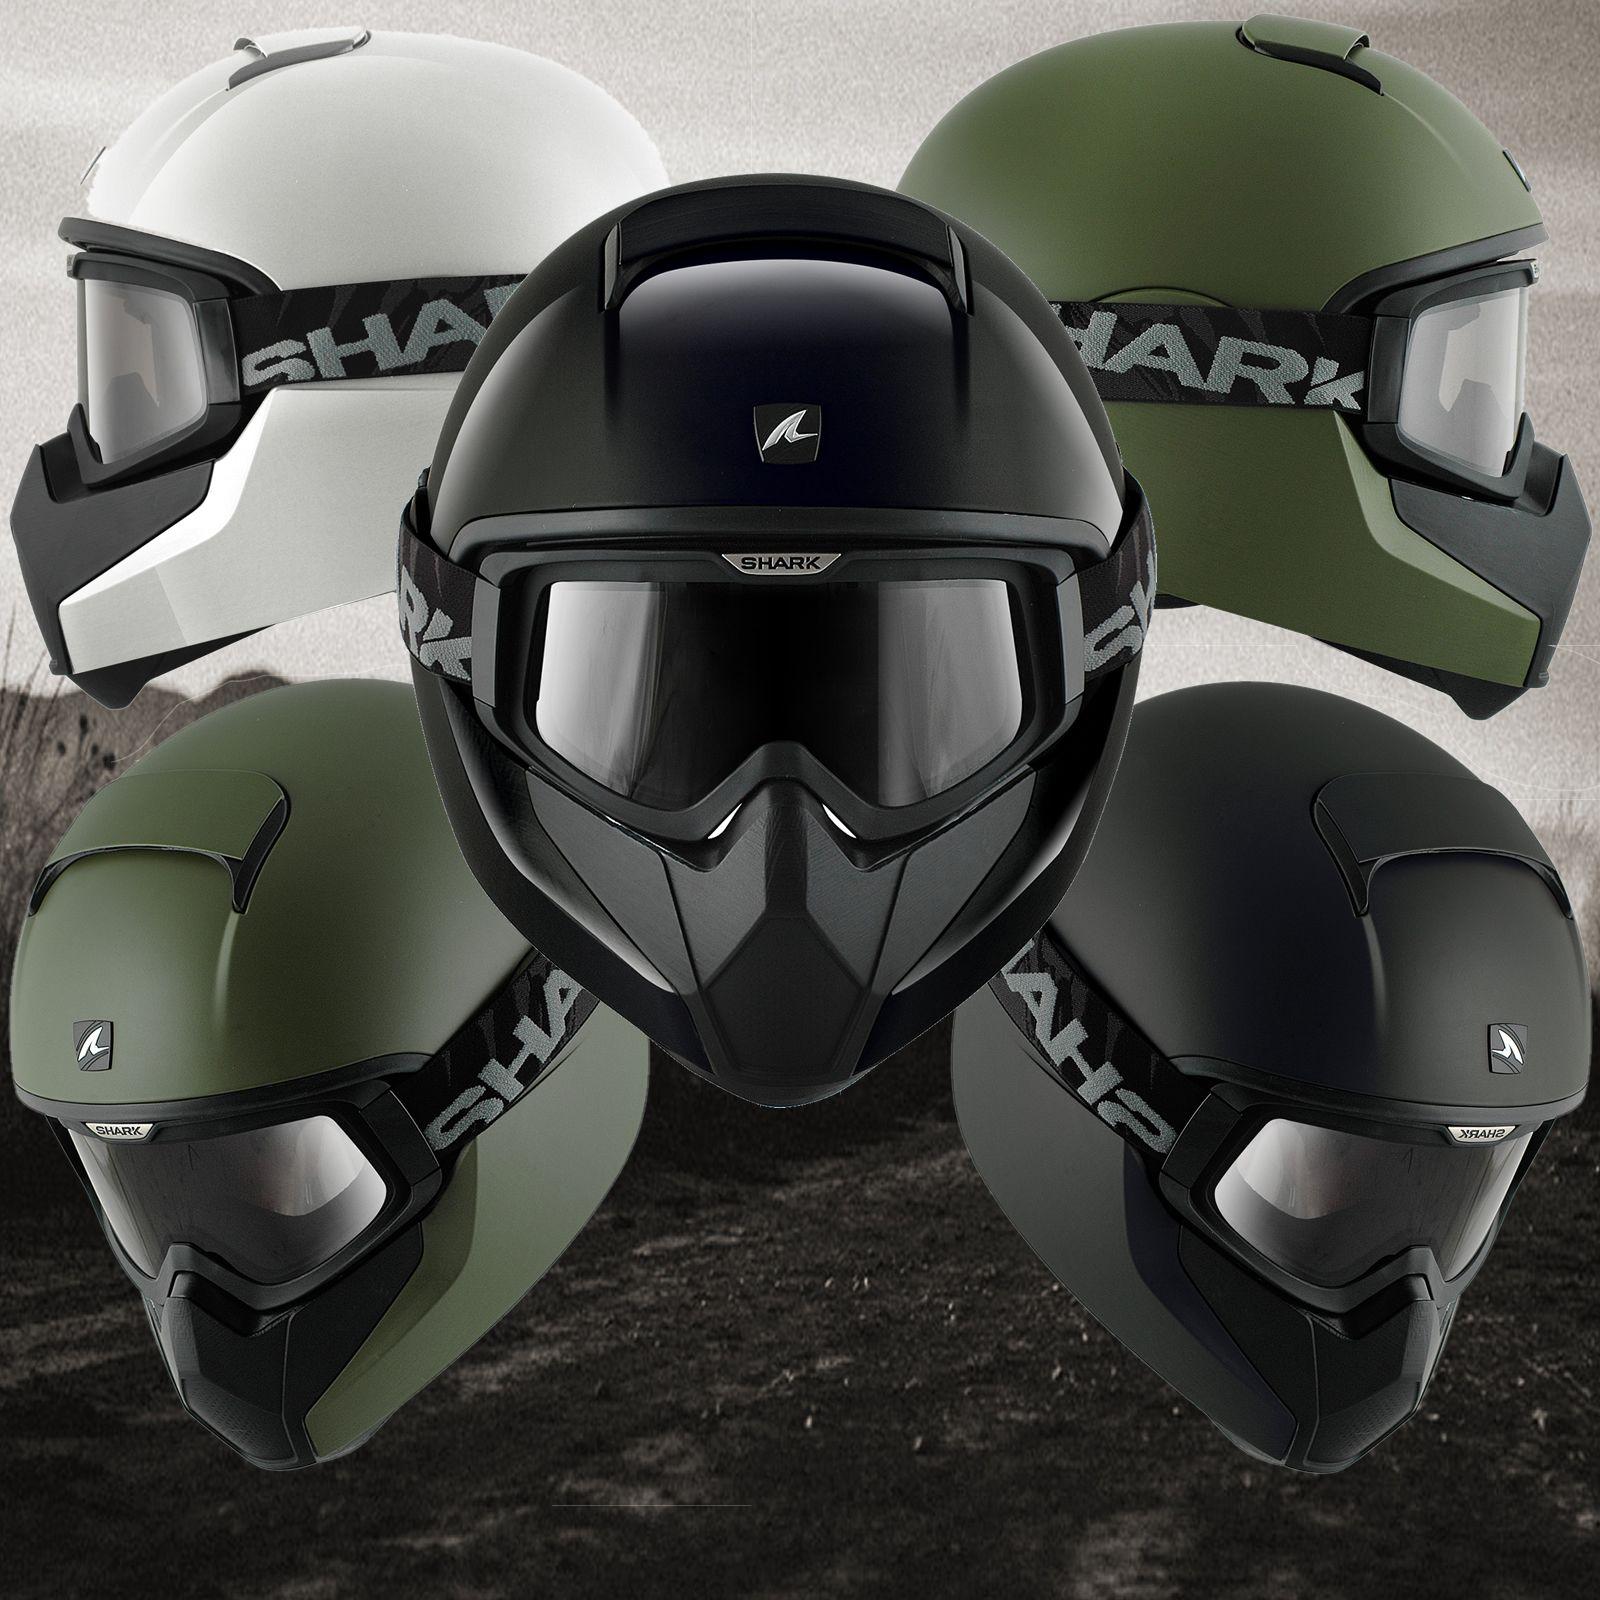 Take to the urban side with the Shark Vancore #Motorcycle #Motorbike #Helmet #Helmets